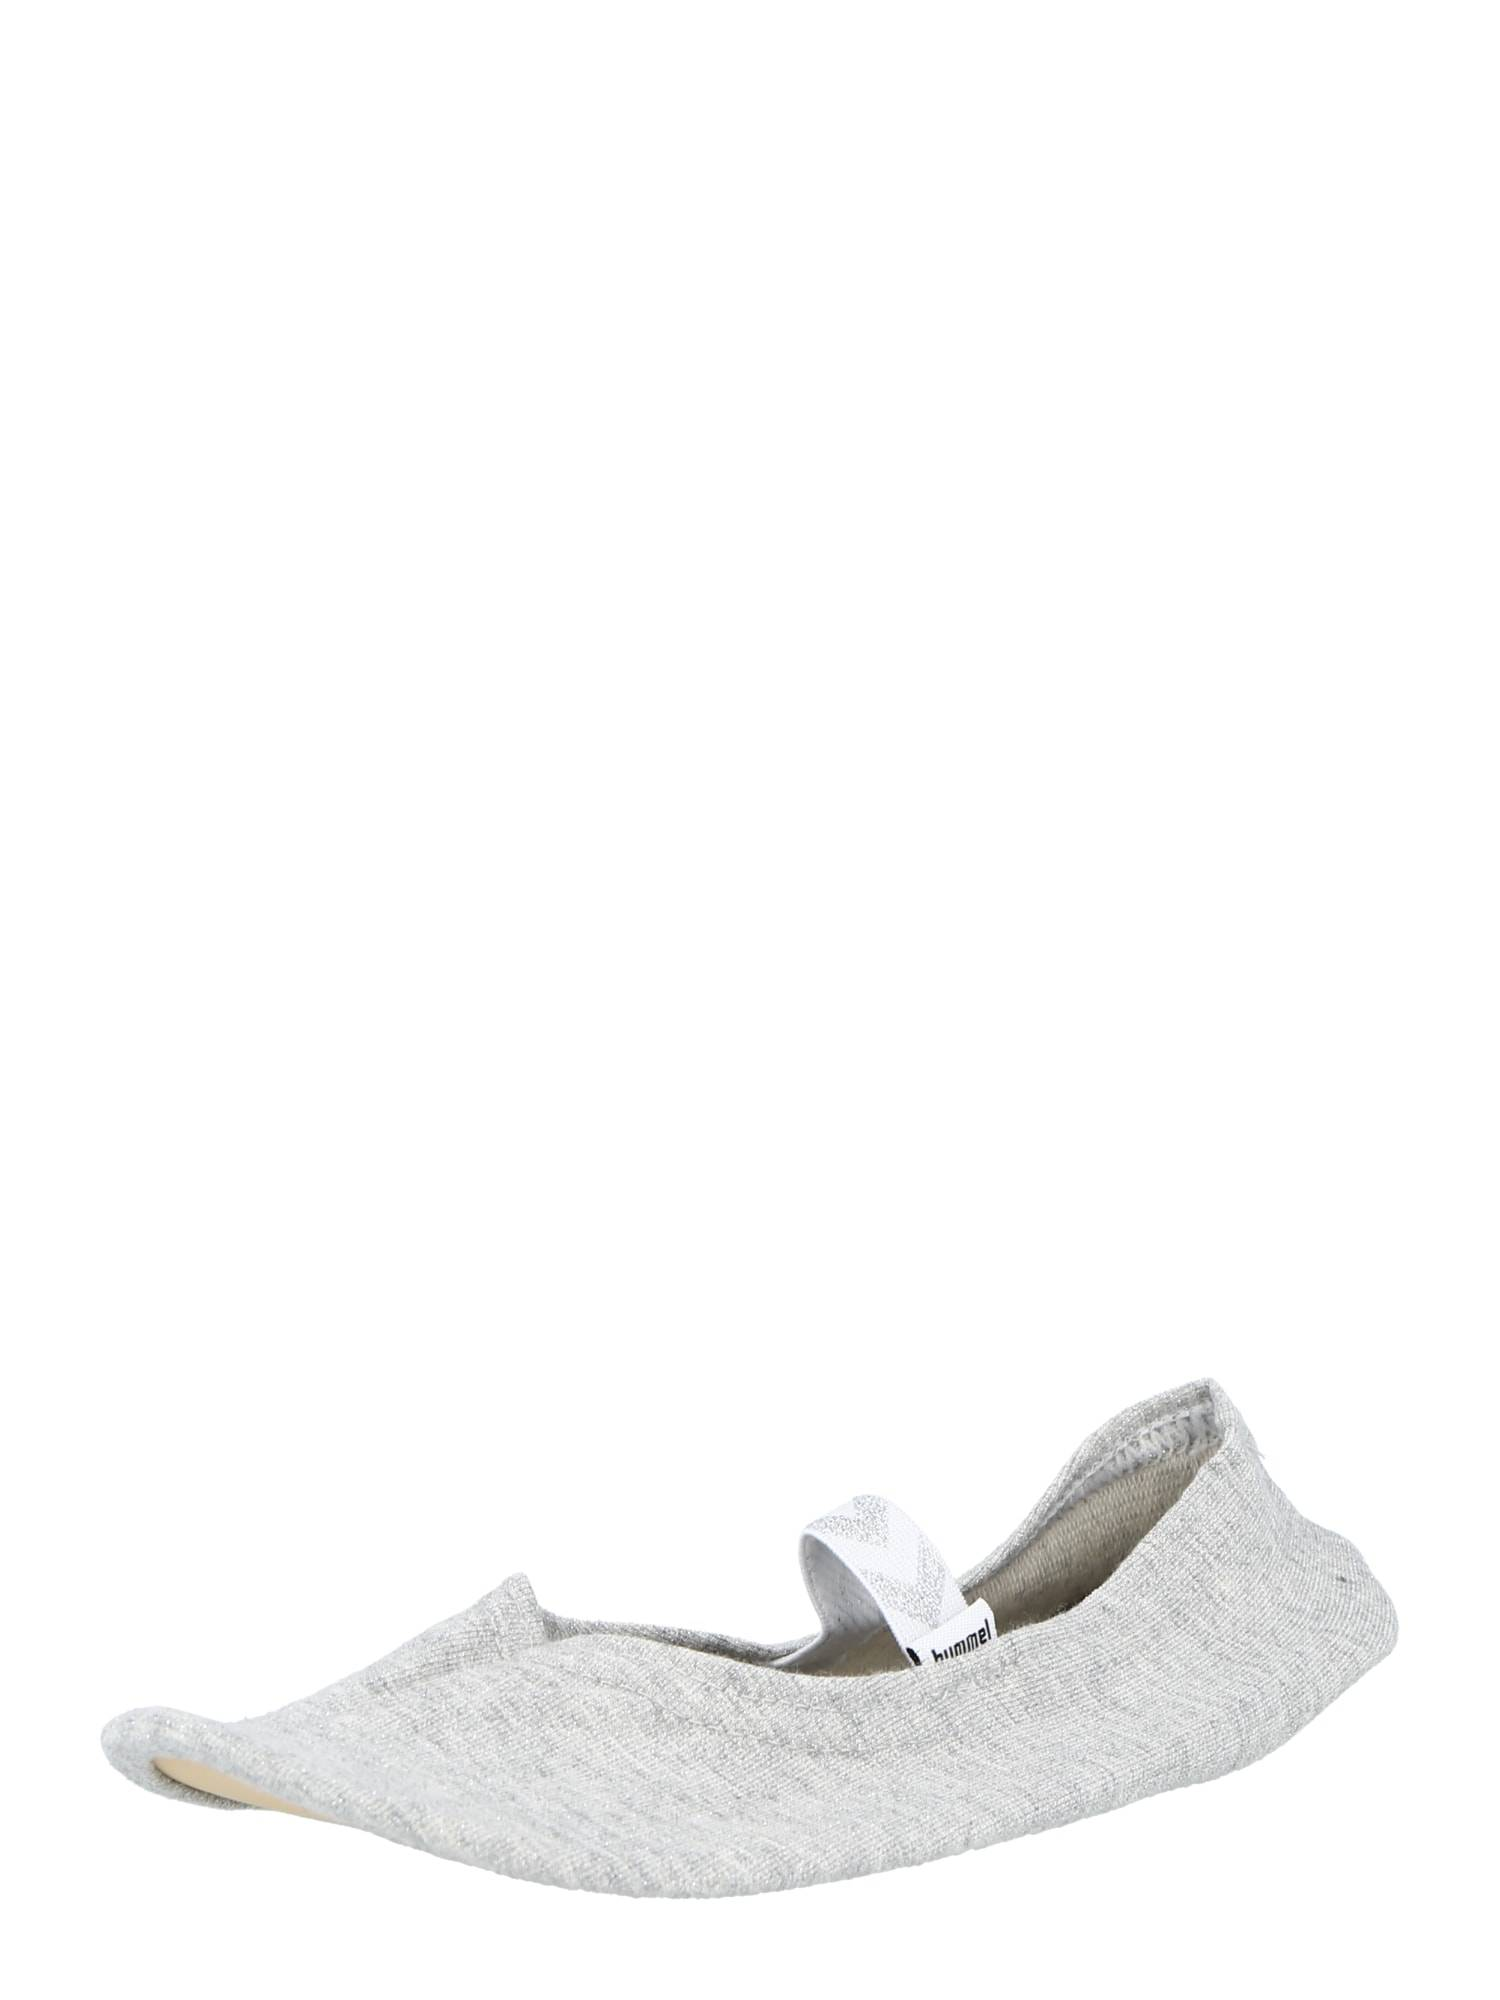 Hummel Chaussure de sport  - Gris - Taille: 27 - boy